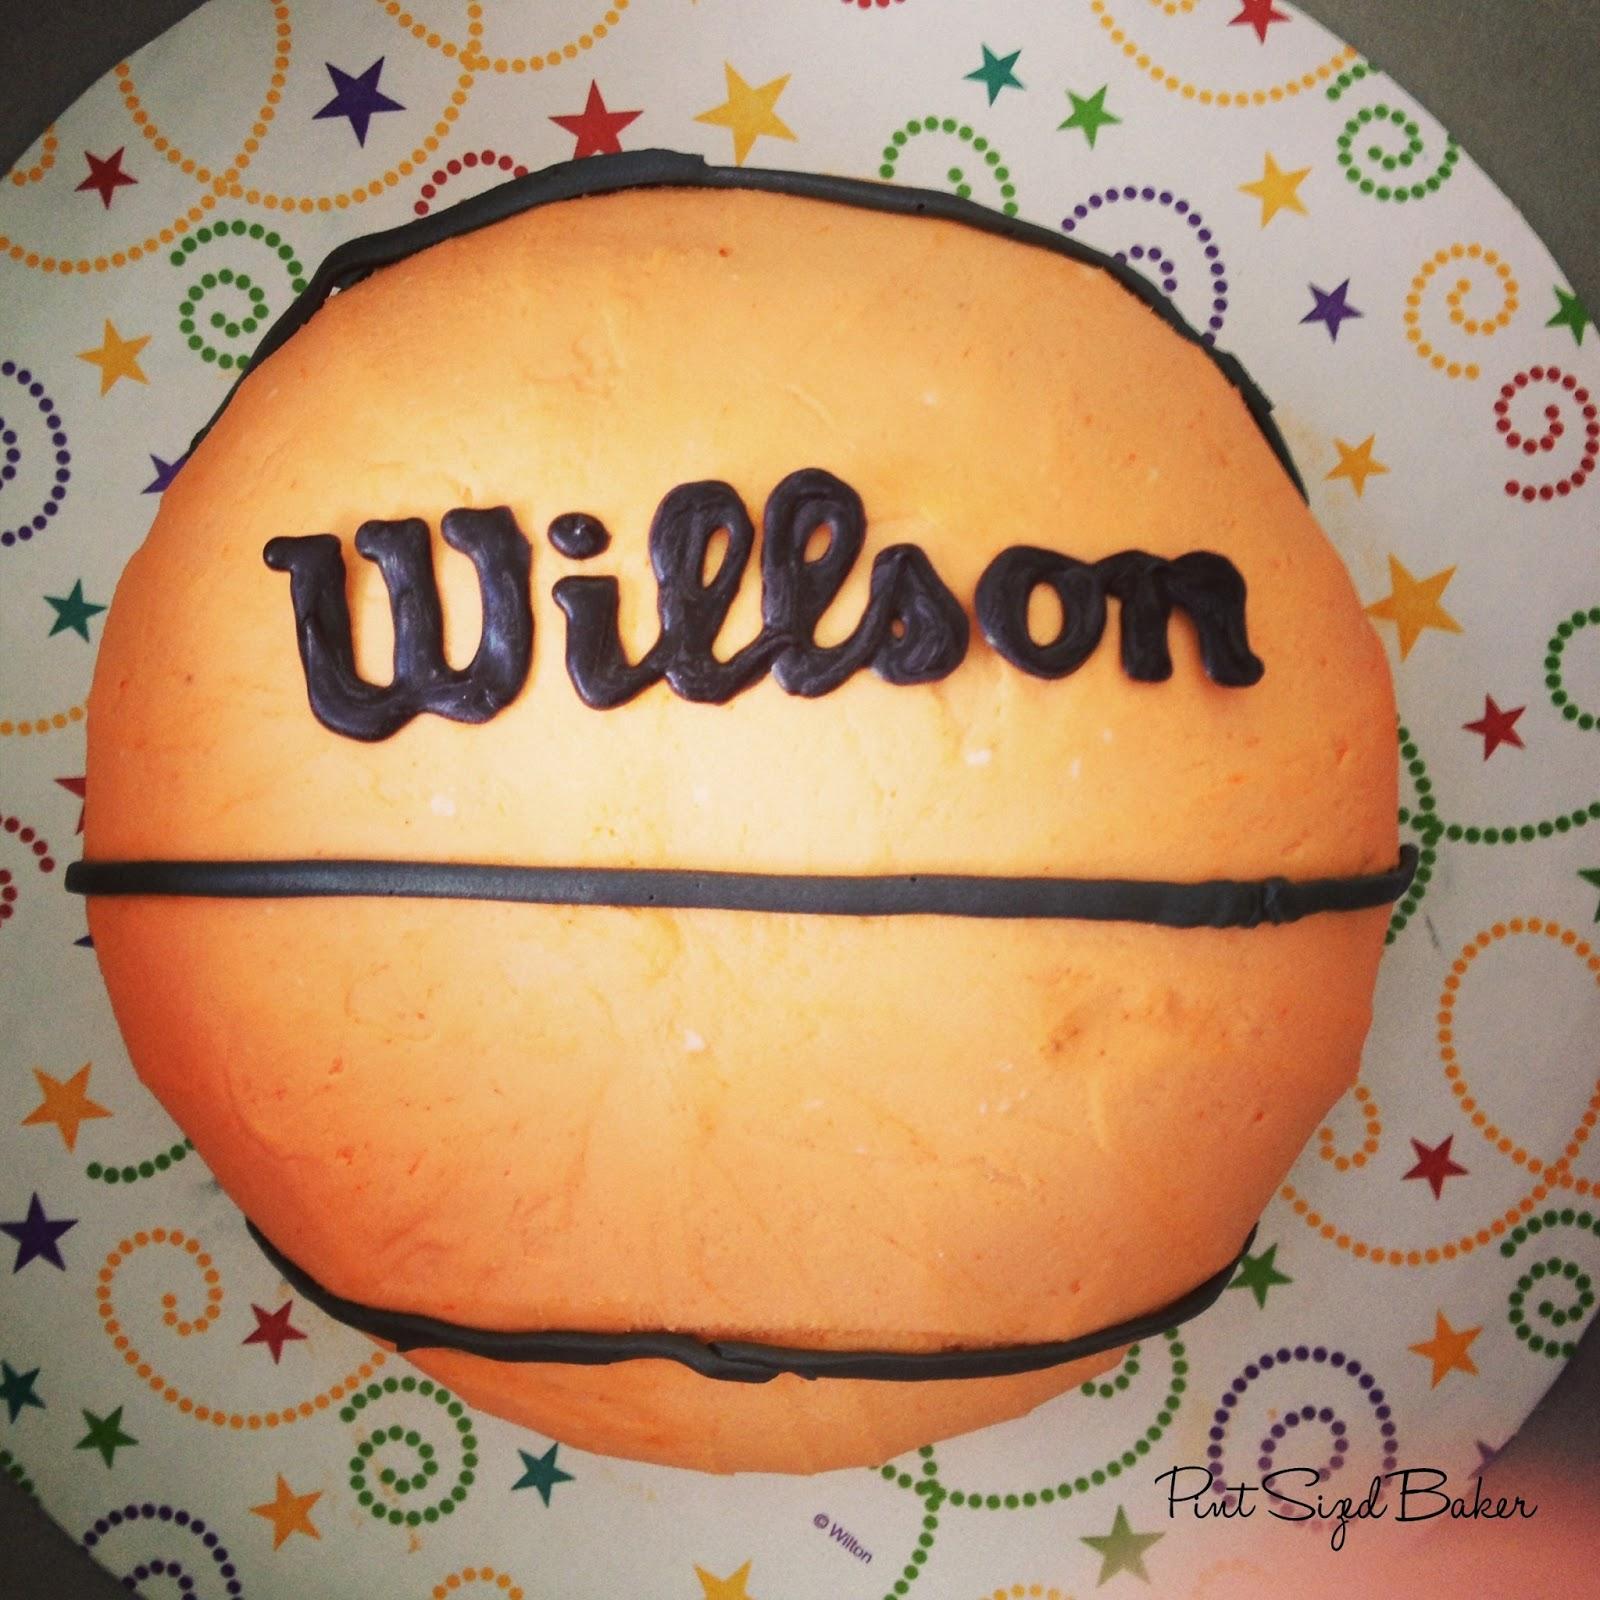 Laker S Jersey And Basketball Cake Pint Sized Baker